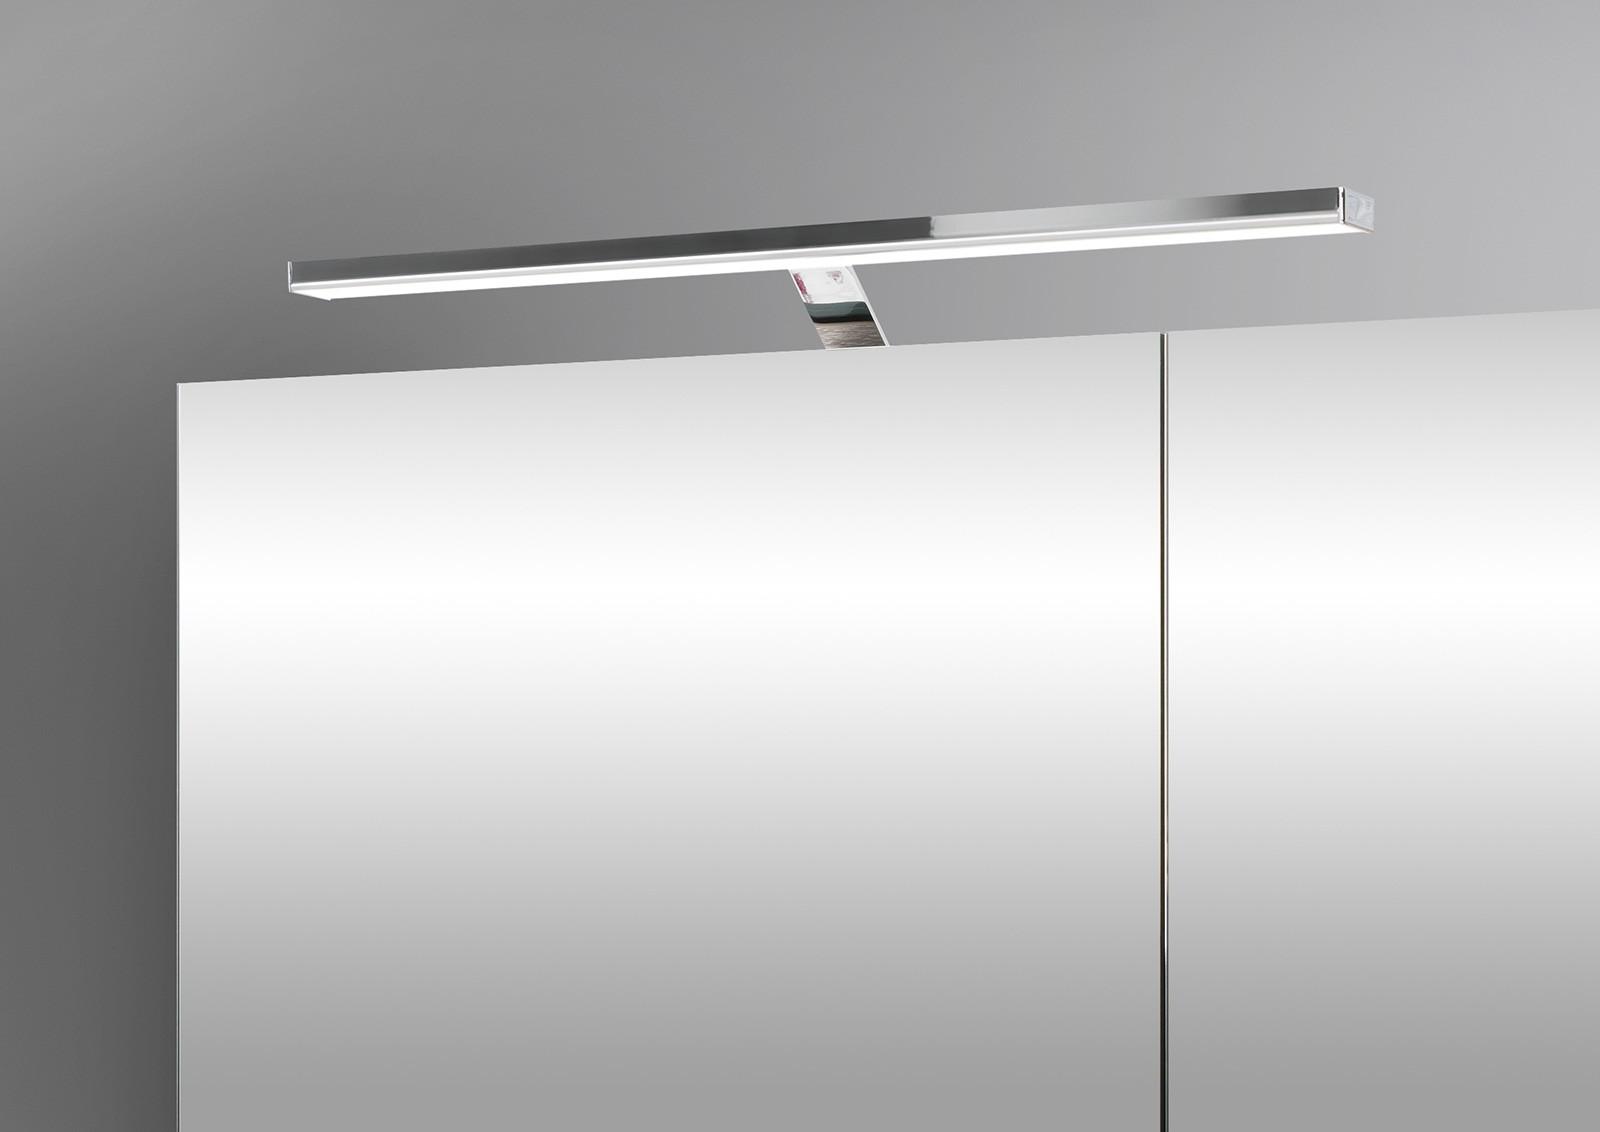 Spiegelschrank bad 80 cm led beleuchtung doppelseitig verspiegelt 5191 - Spiegelschrank bad 80 cm ...